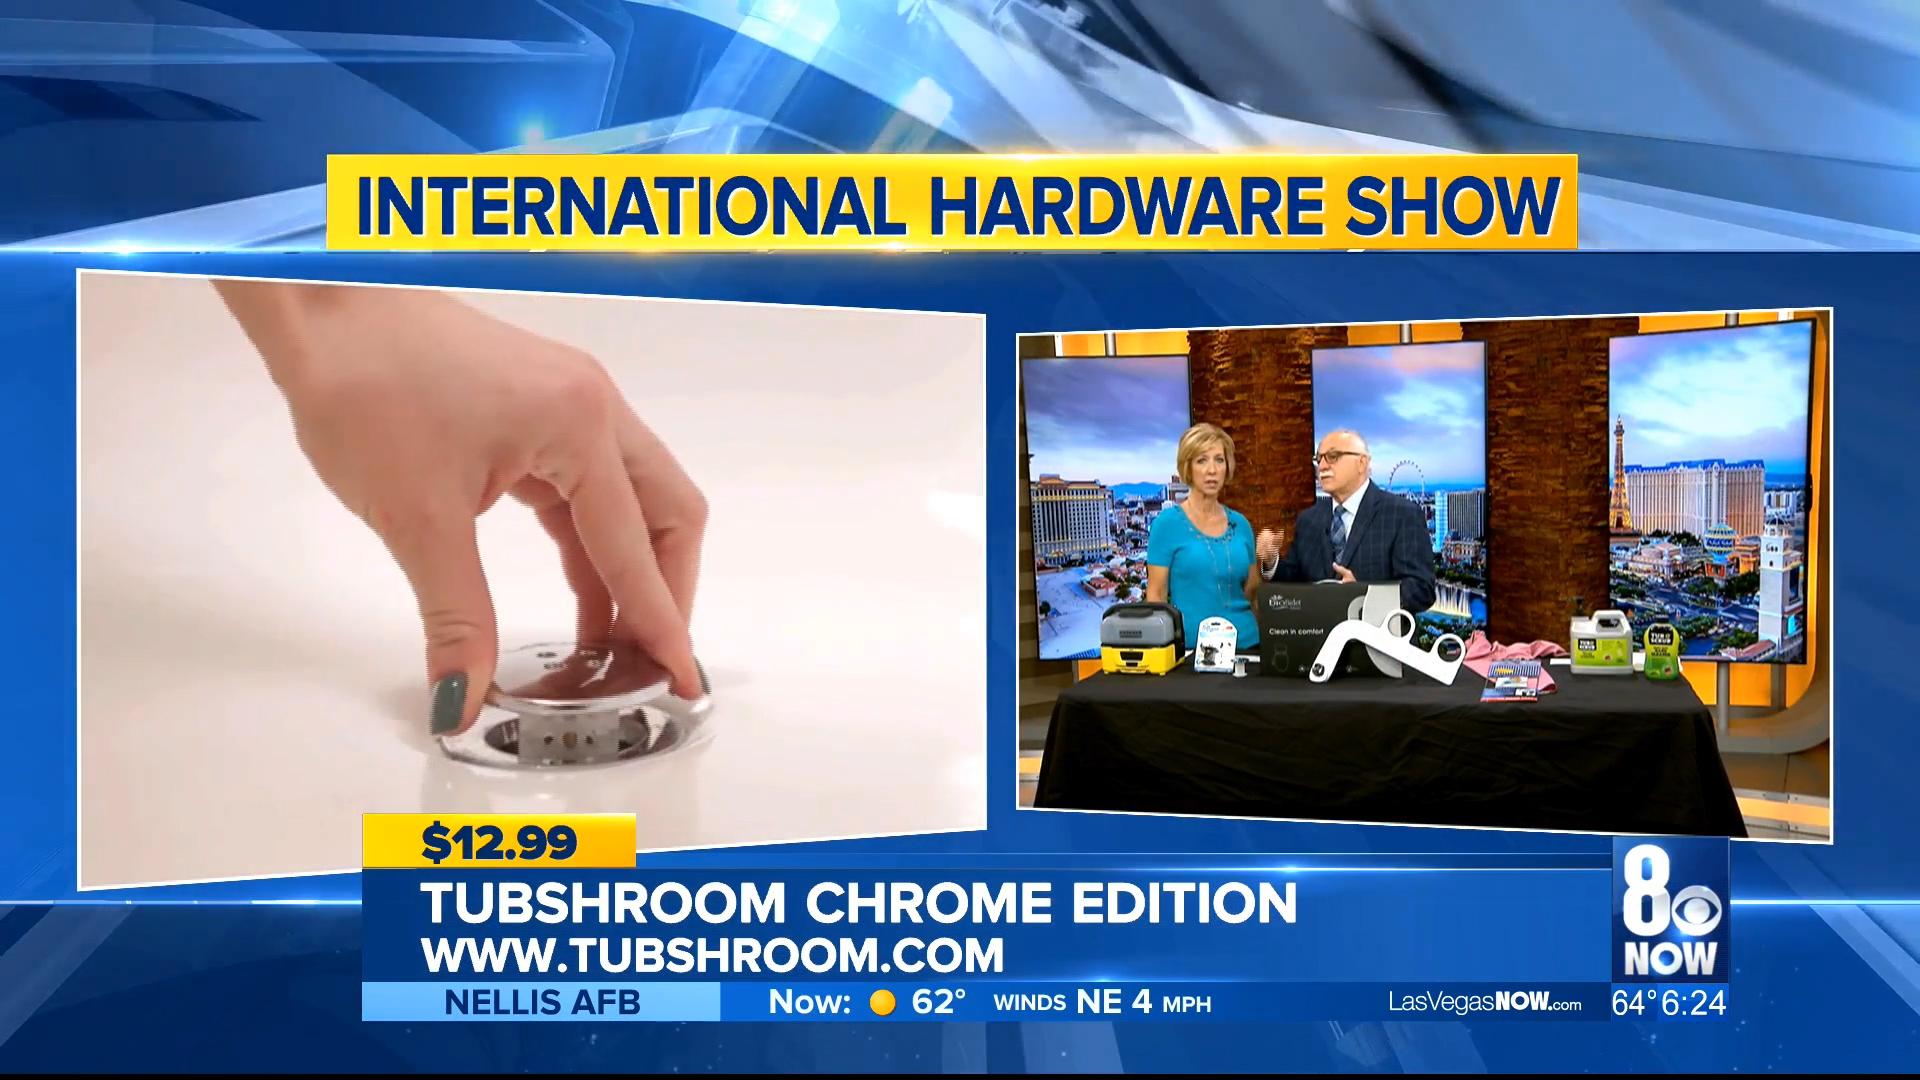 TUBSHROOM CHROME EDITION – BLACK OR CLEAR - $12.99Shop Now